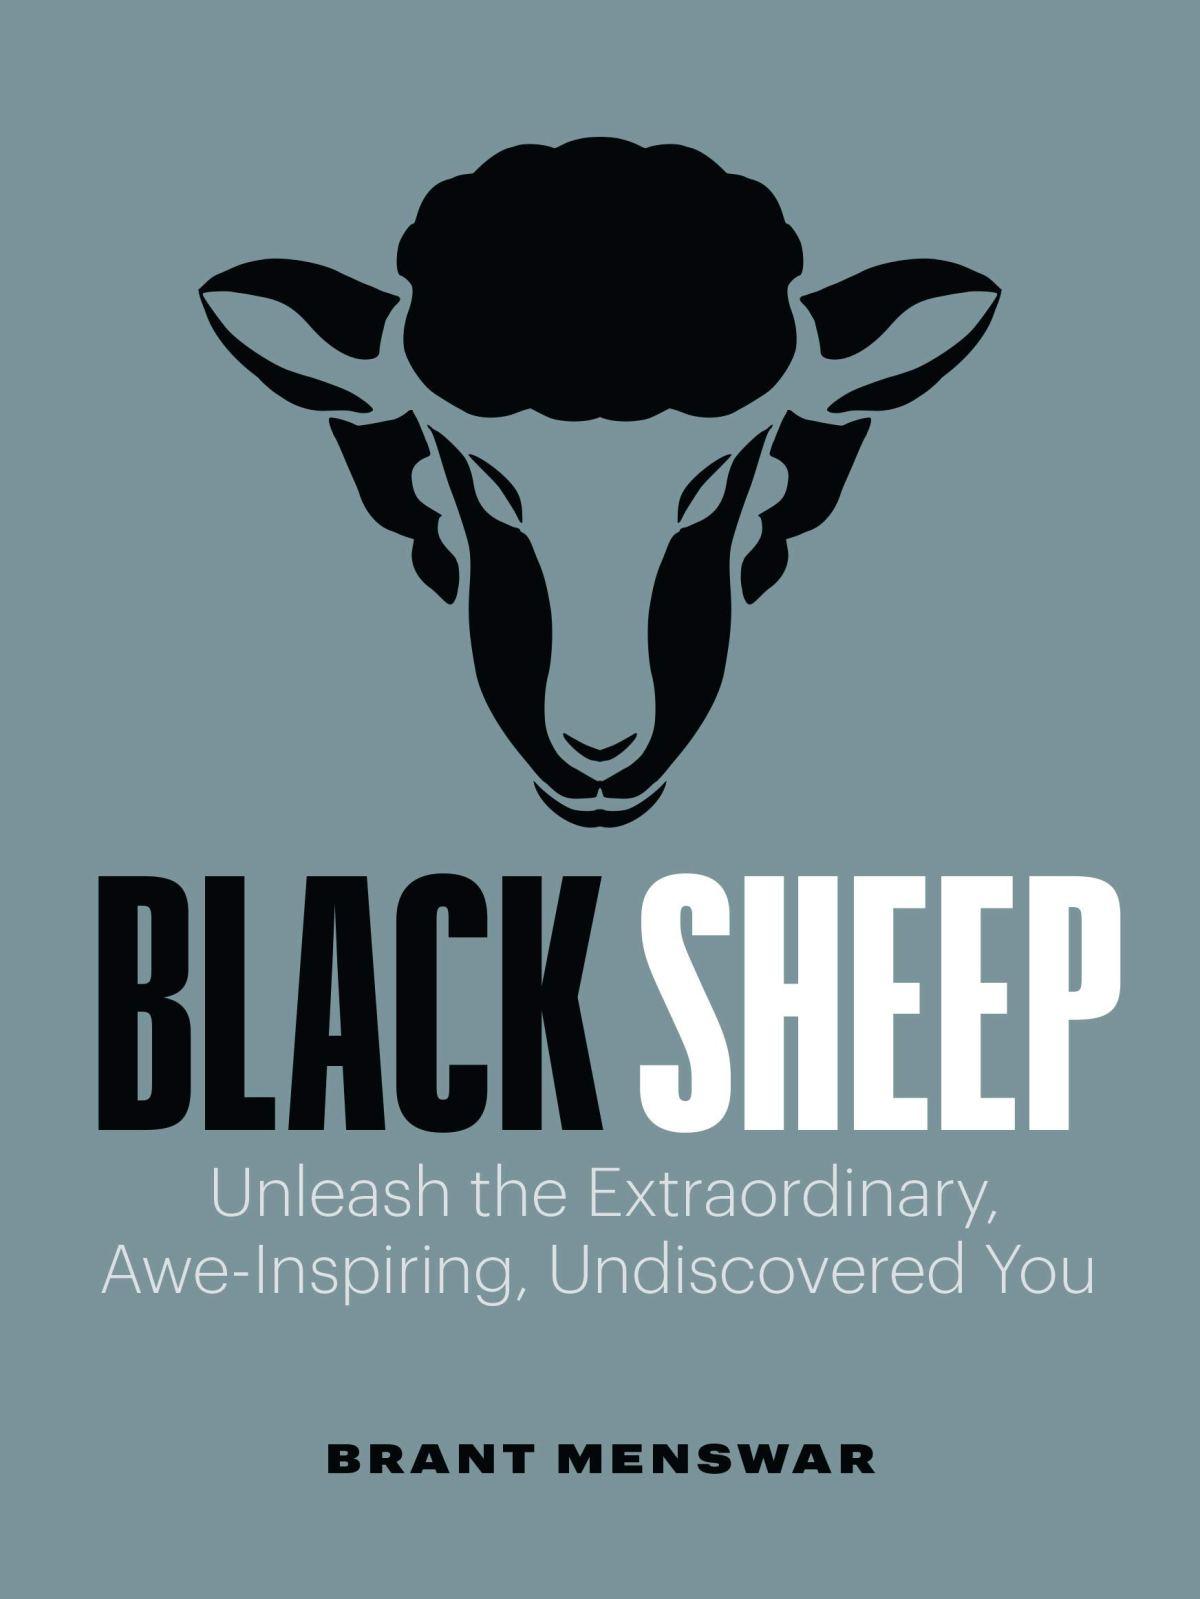 Black Sheep: Unleash the Extraordinary, Awe-Inspiring, Undiscovered You:  Menswar, Brant: 9781989603444: Amazon.com: Books